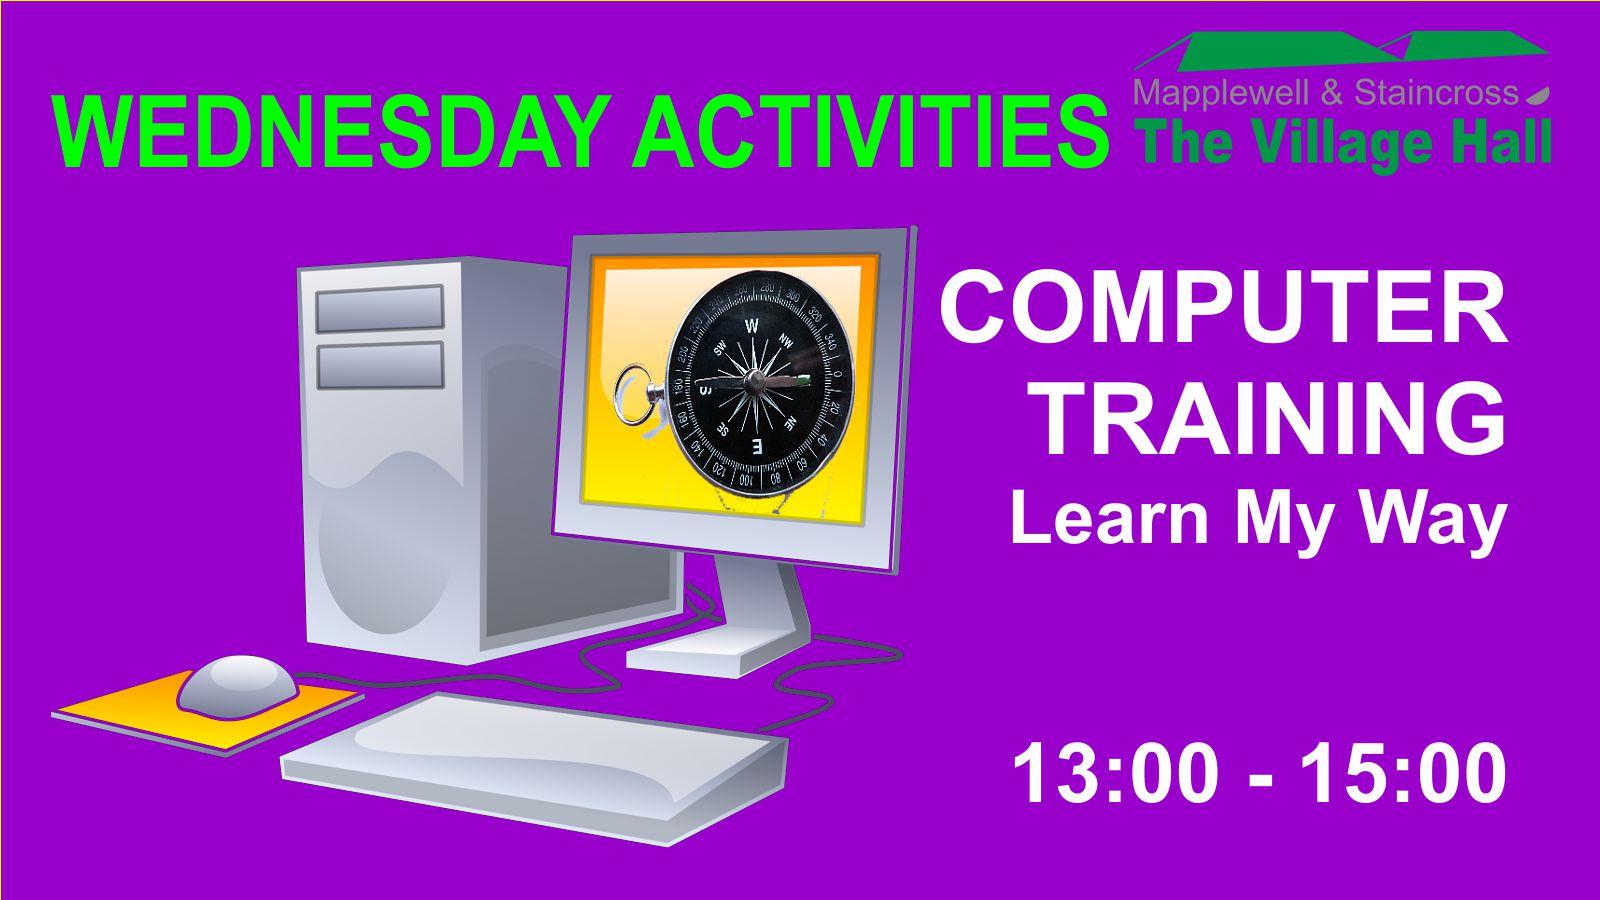 (C) Nick Hibberd - Computer Training